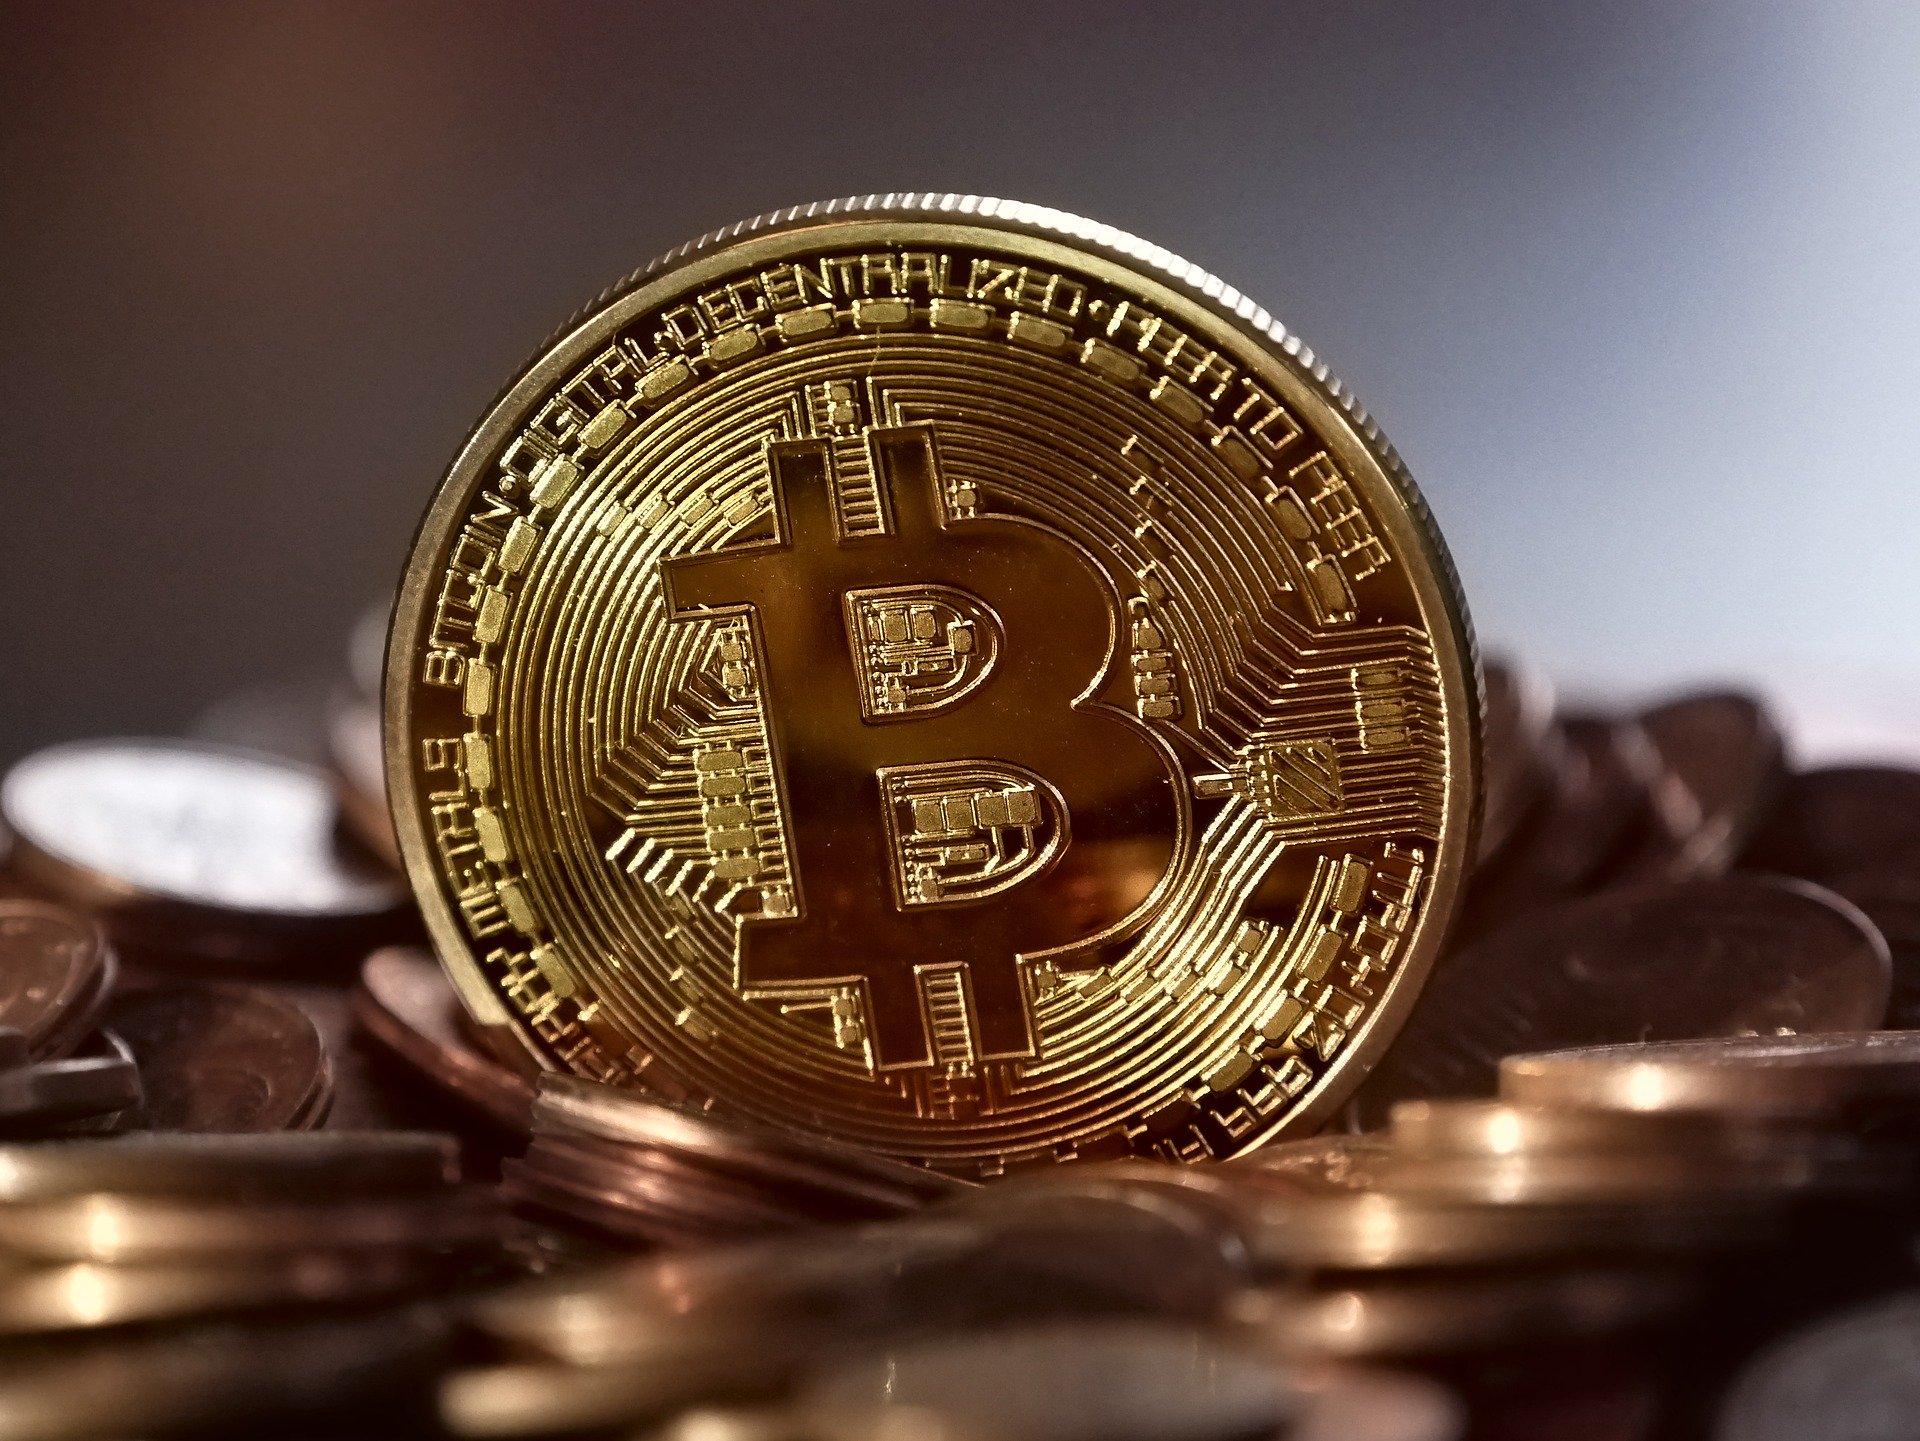 bitcoin coin shinny gold